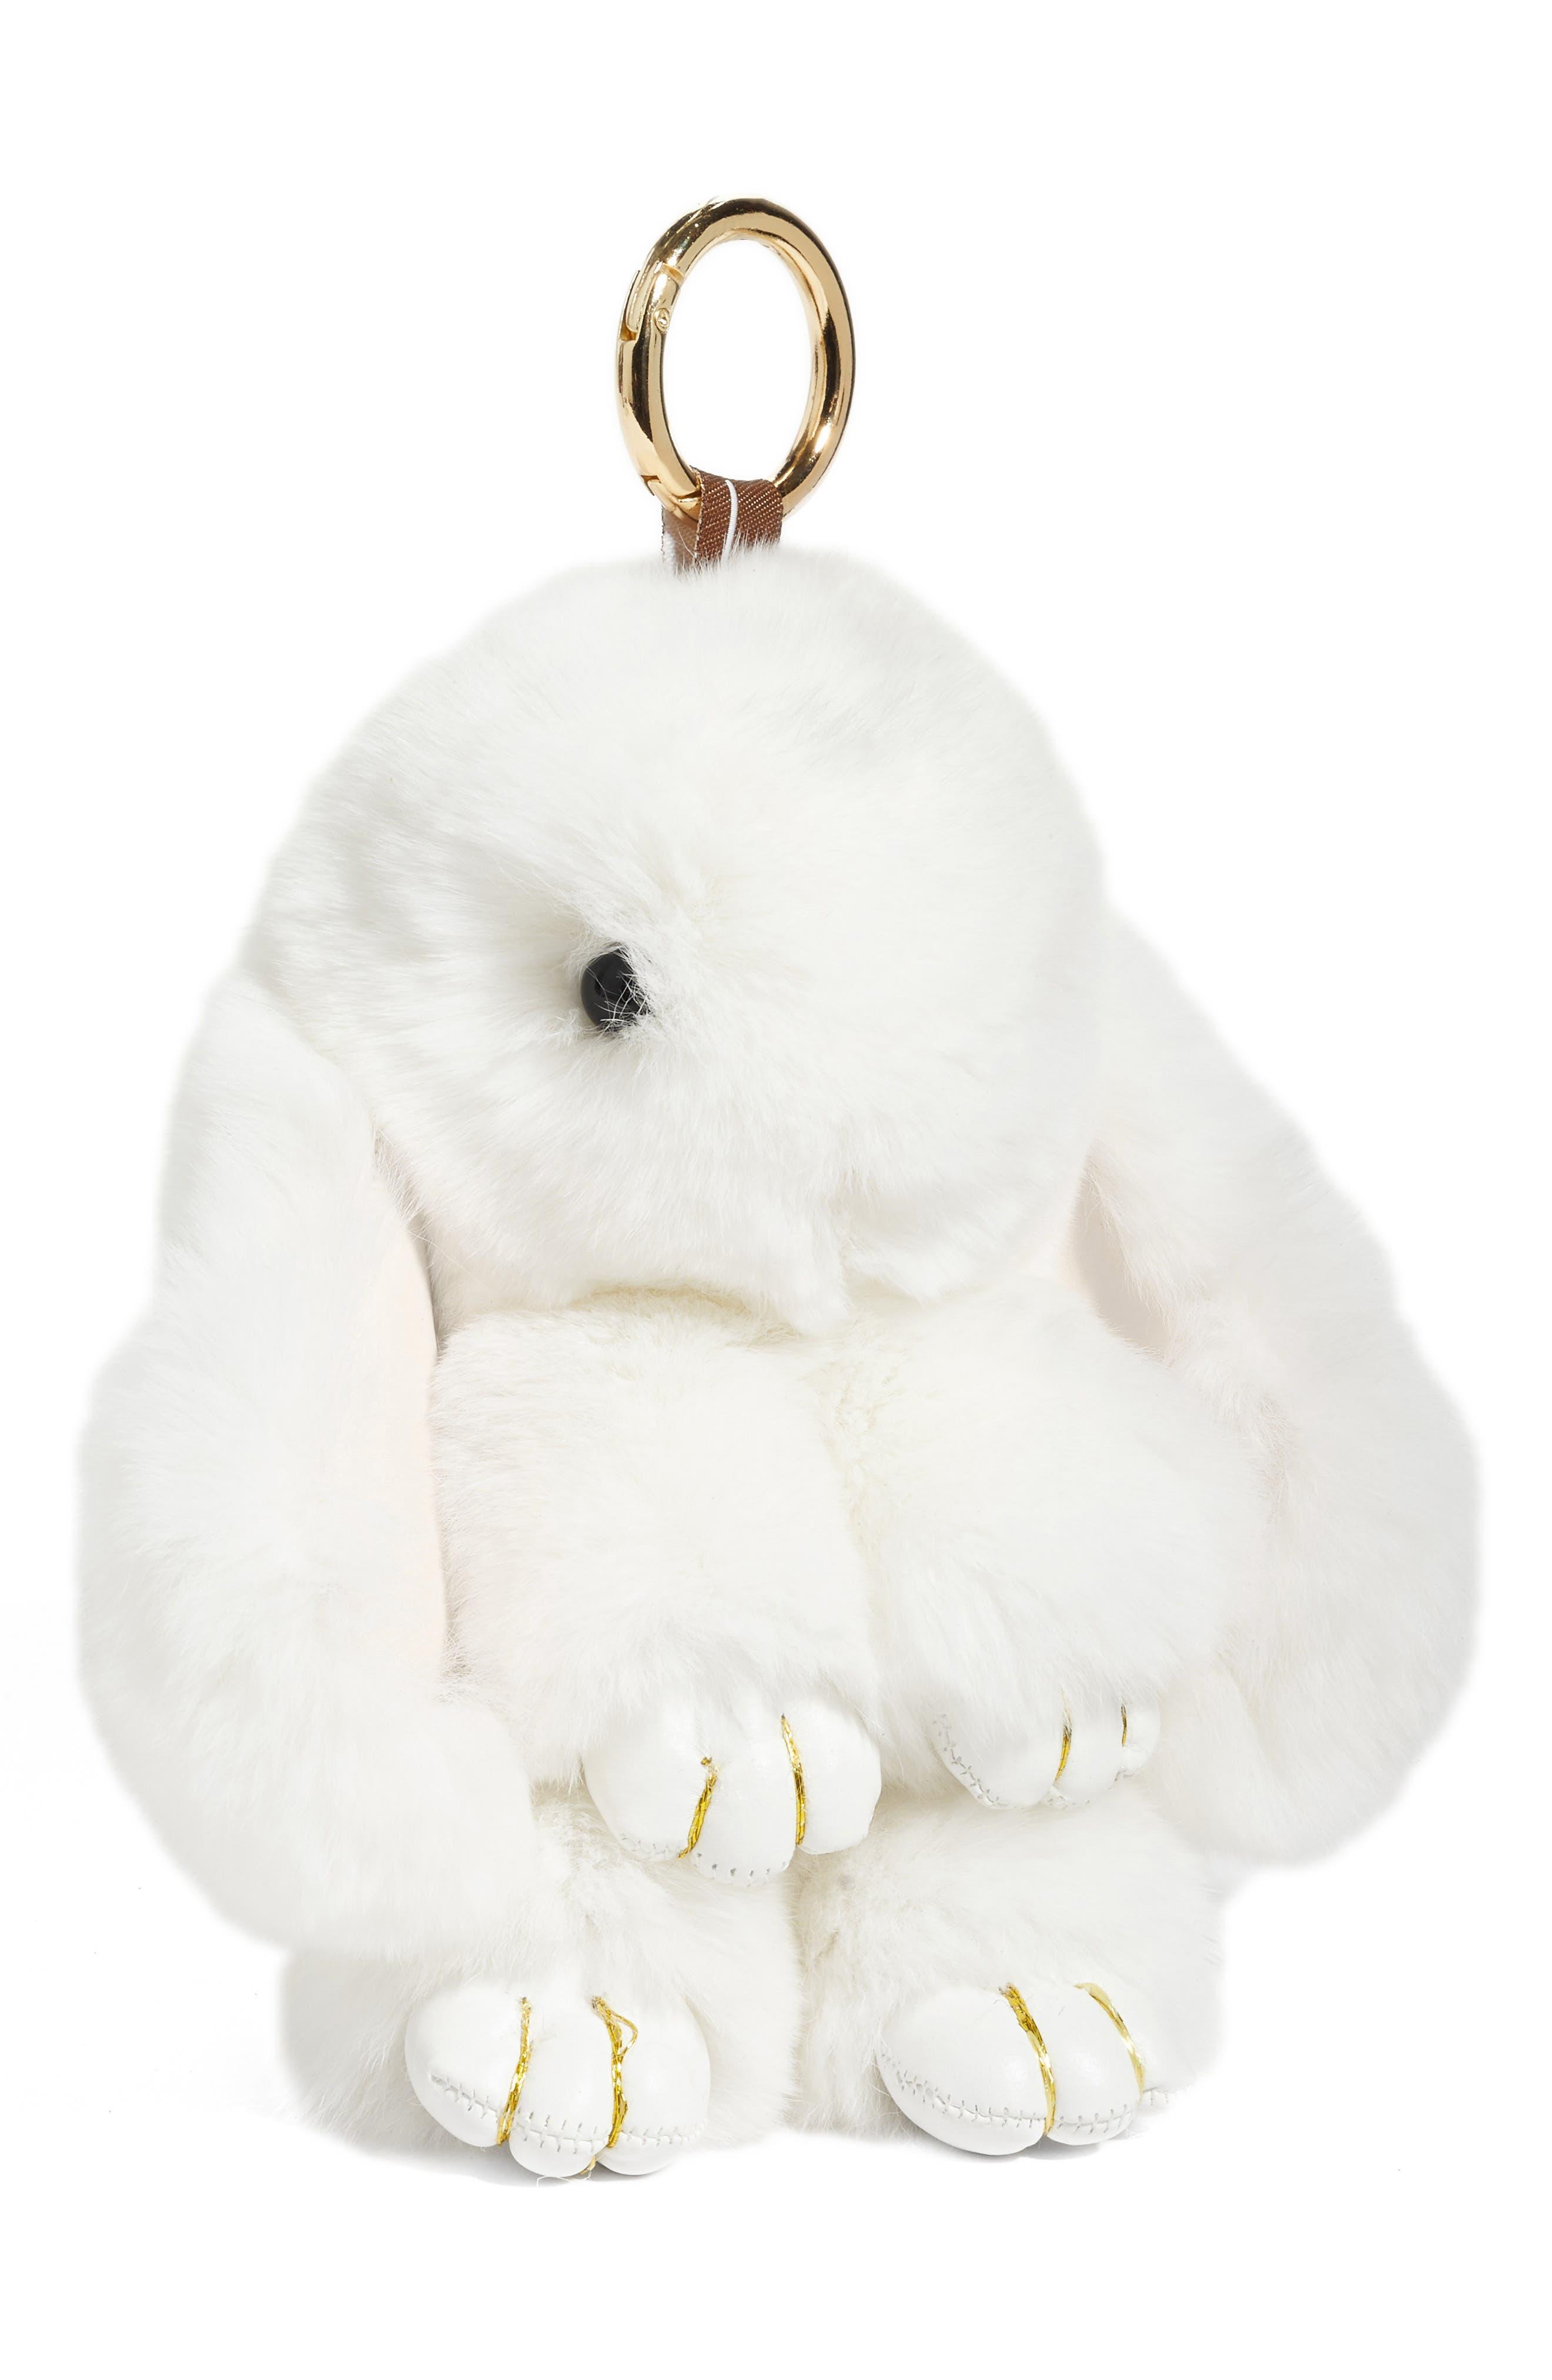 Main Image - Natasha Couture Genuine Rabbit Fur Bag Charm